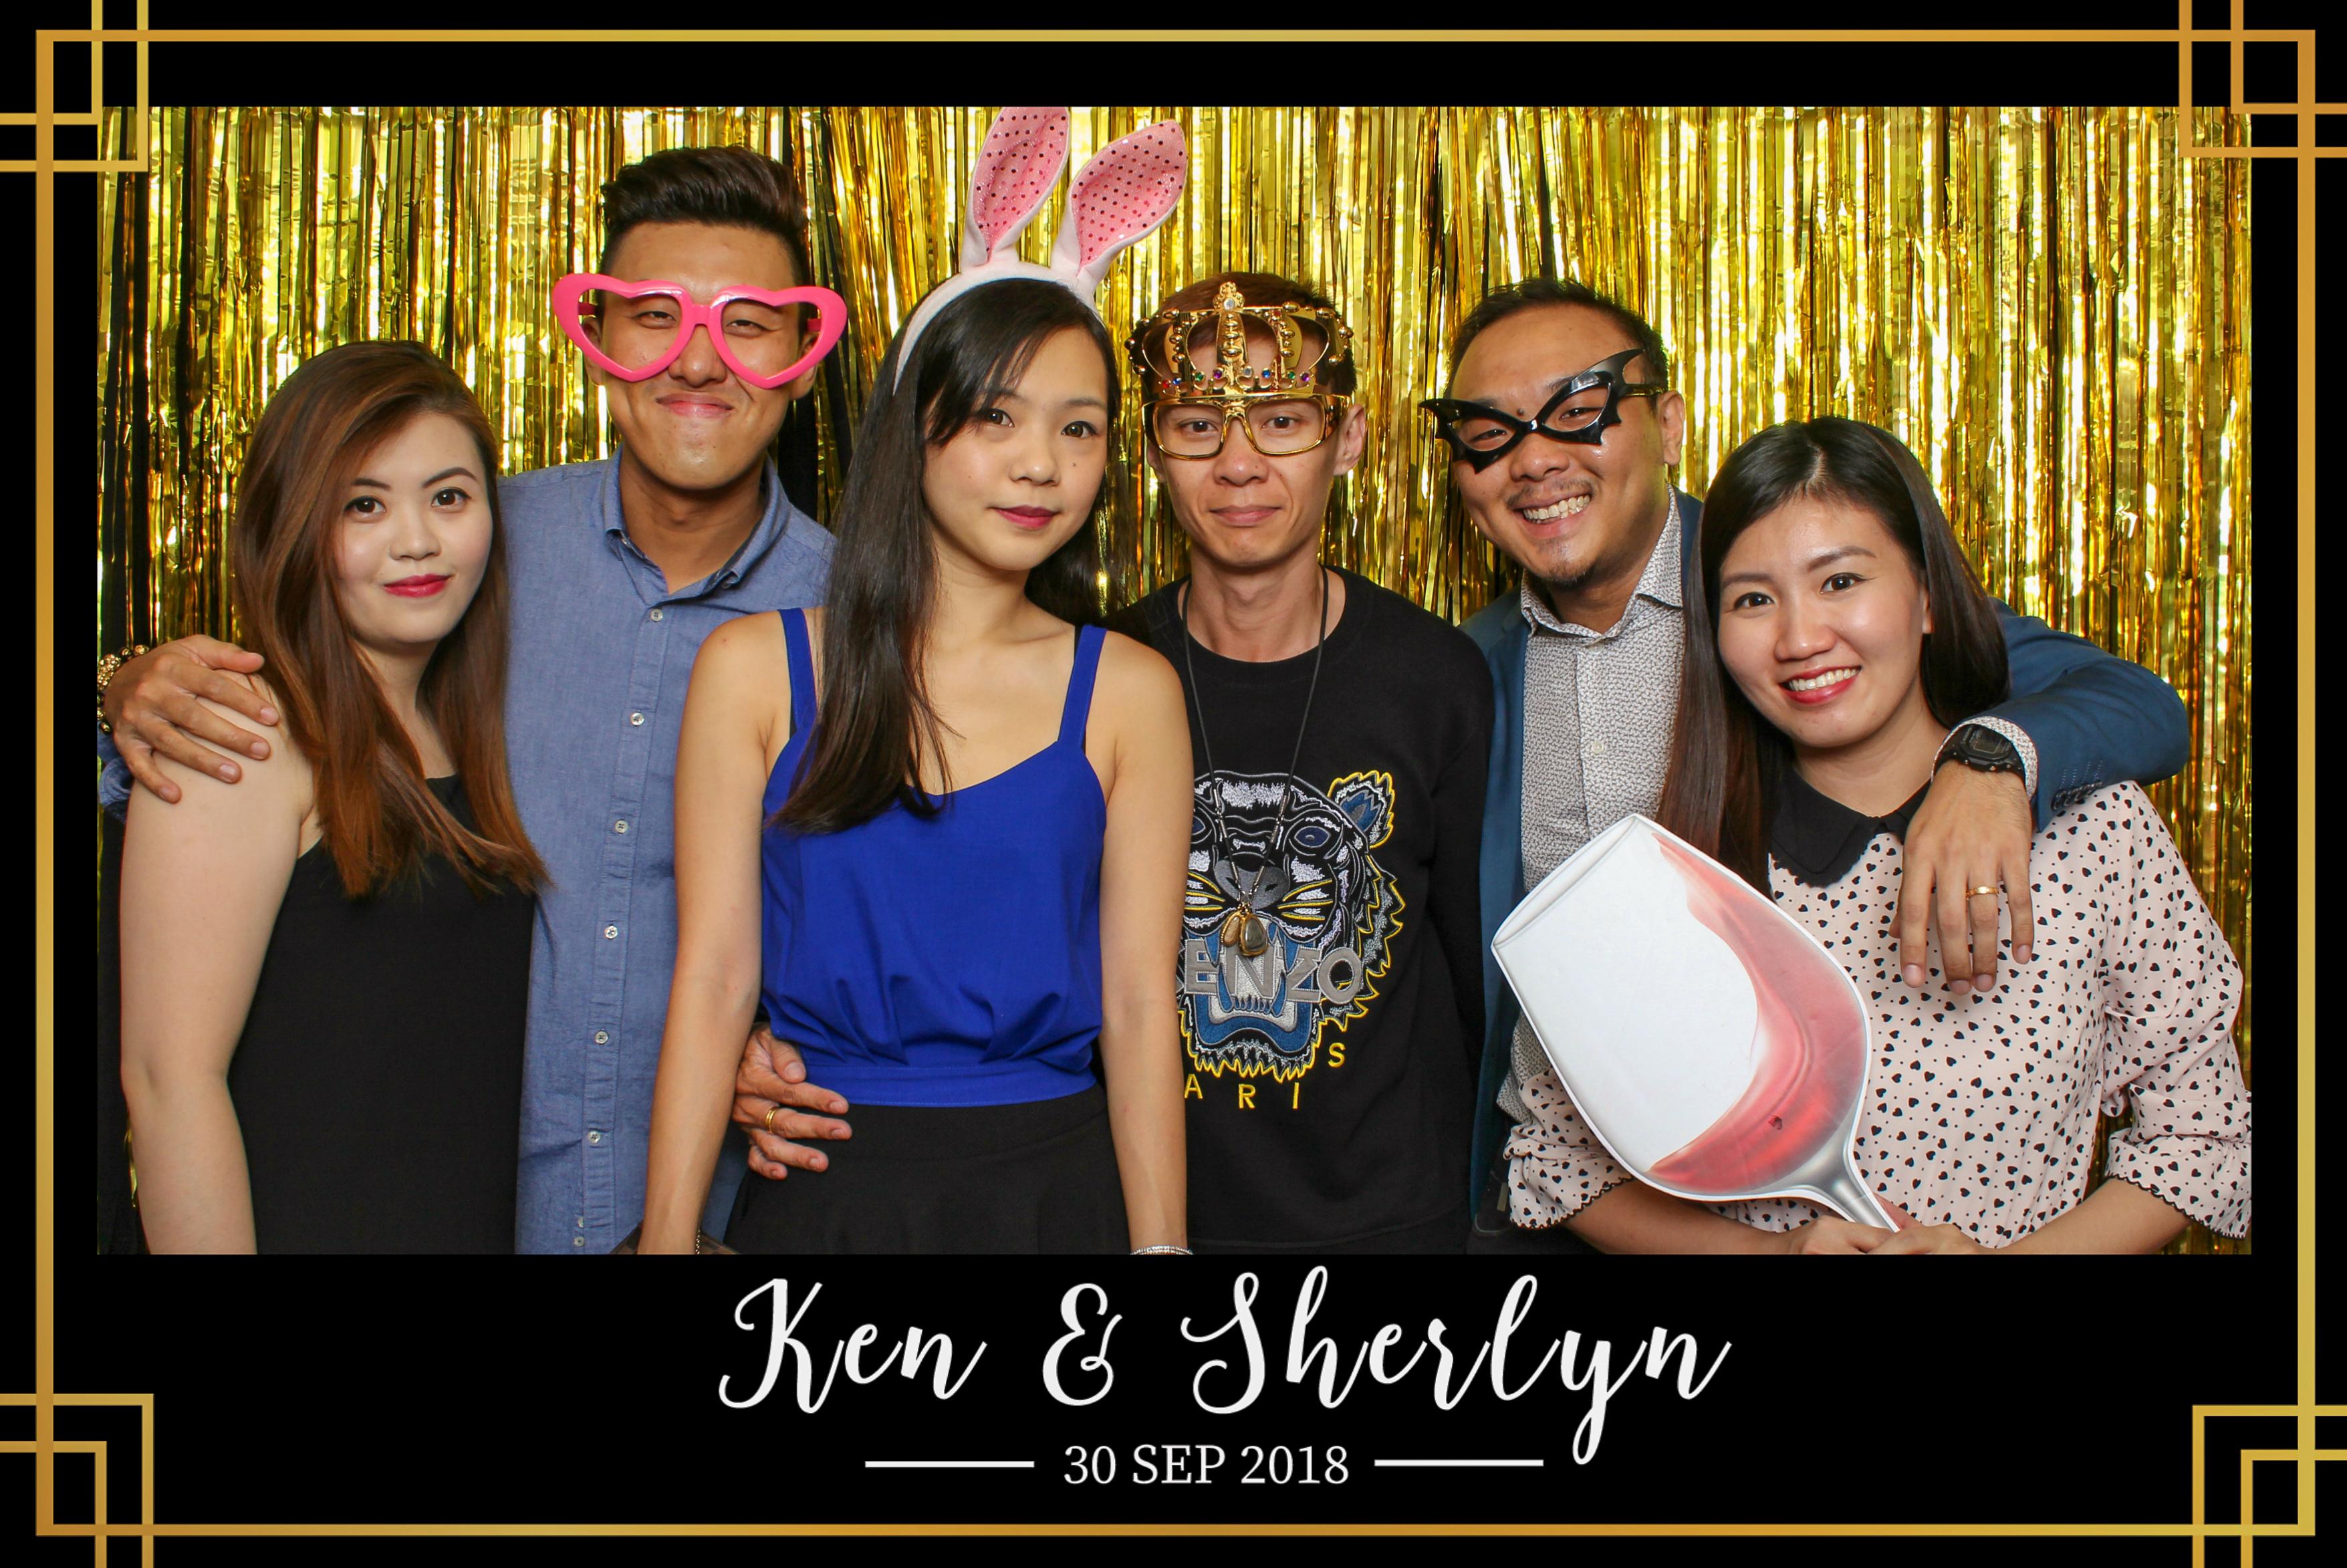 Ken Sherlyn wedding photo booth (34)